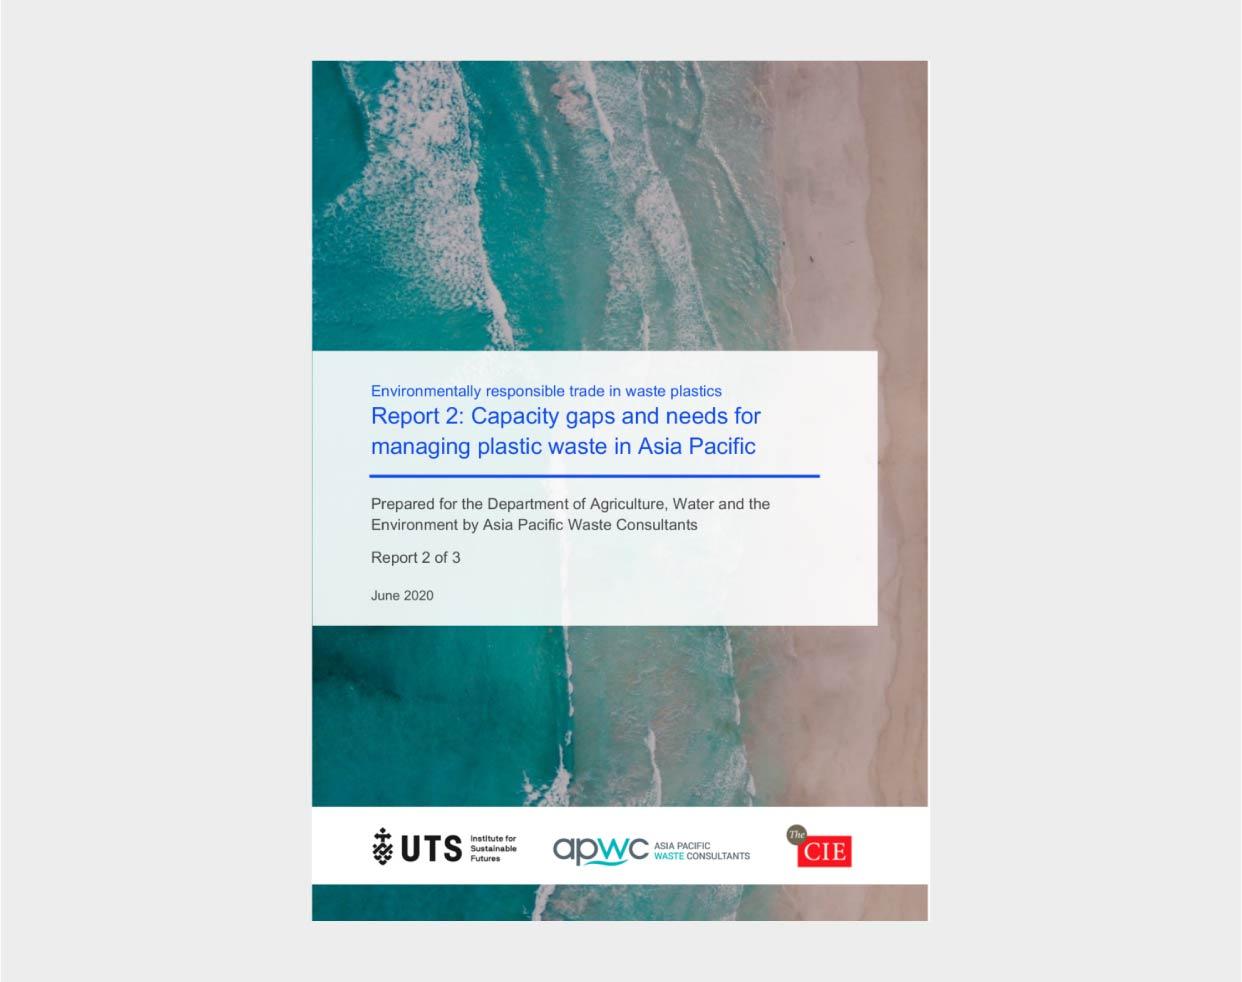 Envirometal waste practice report 2